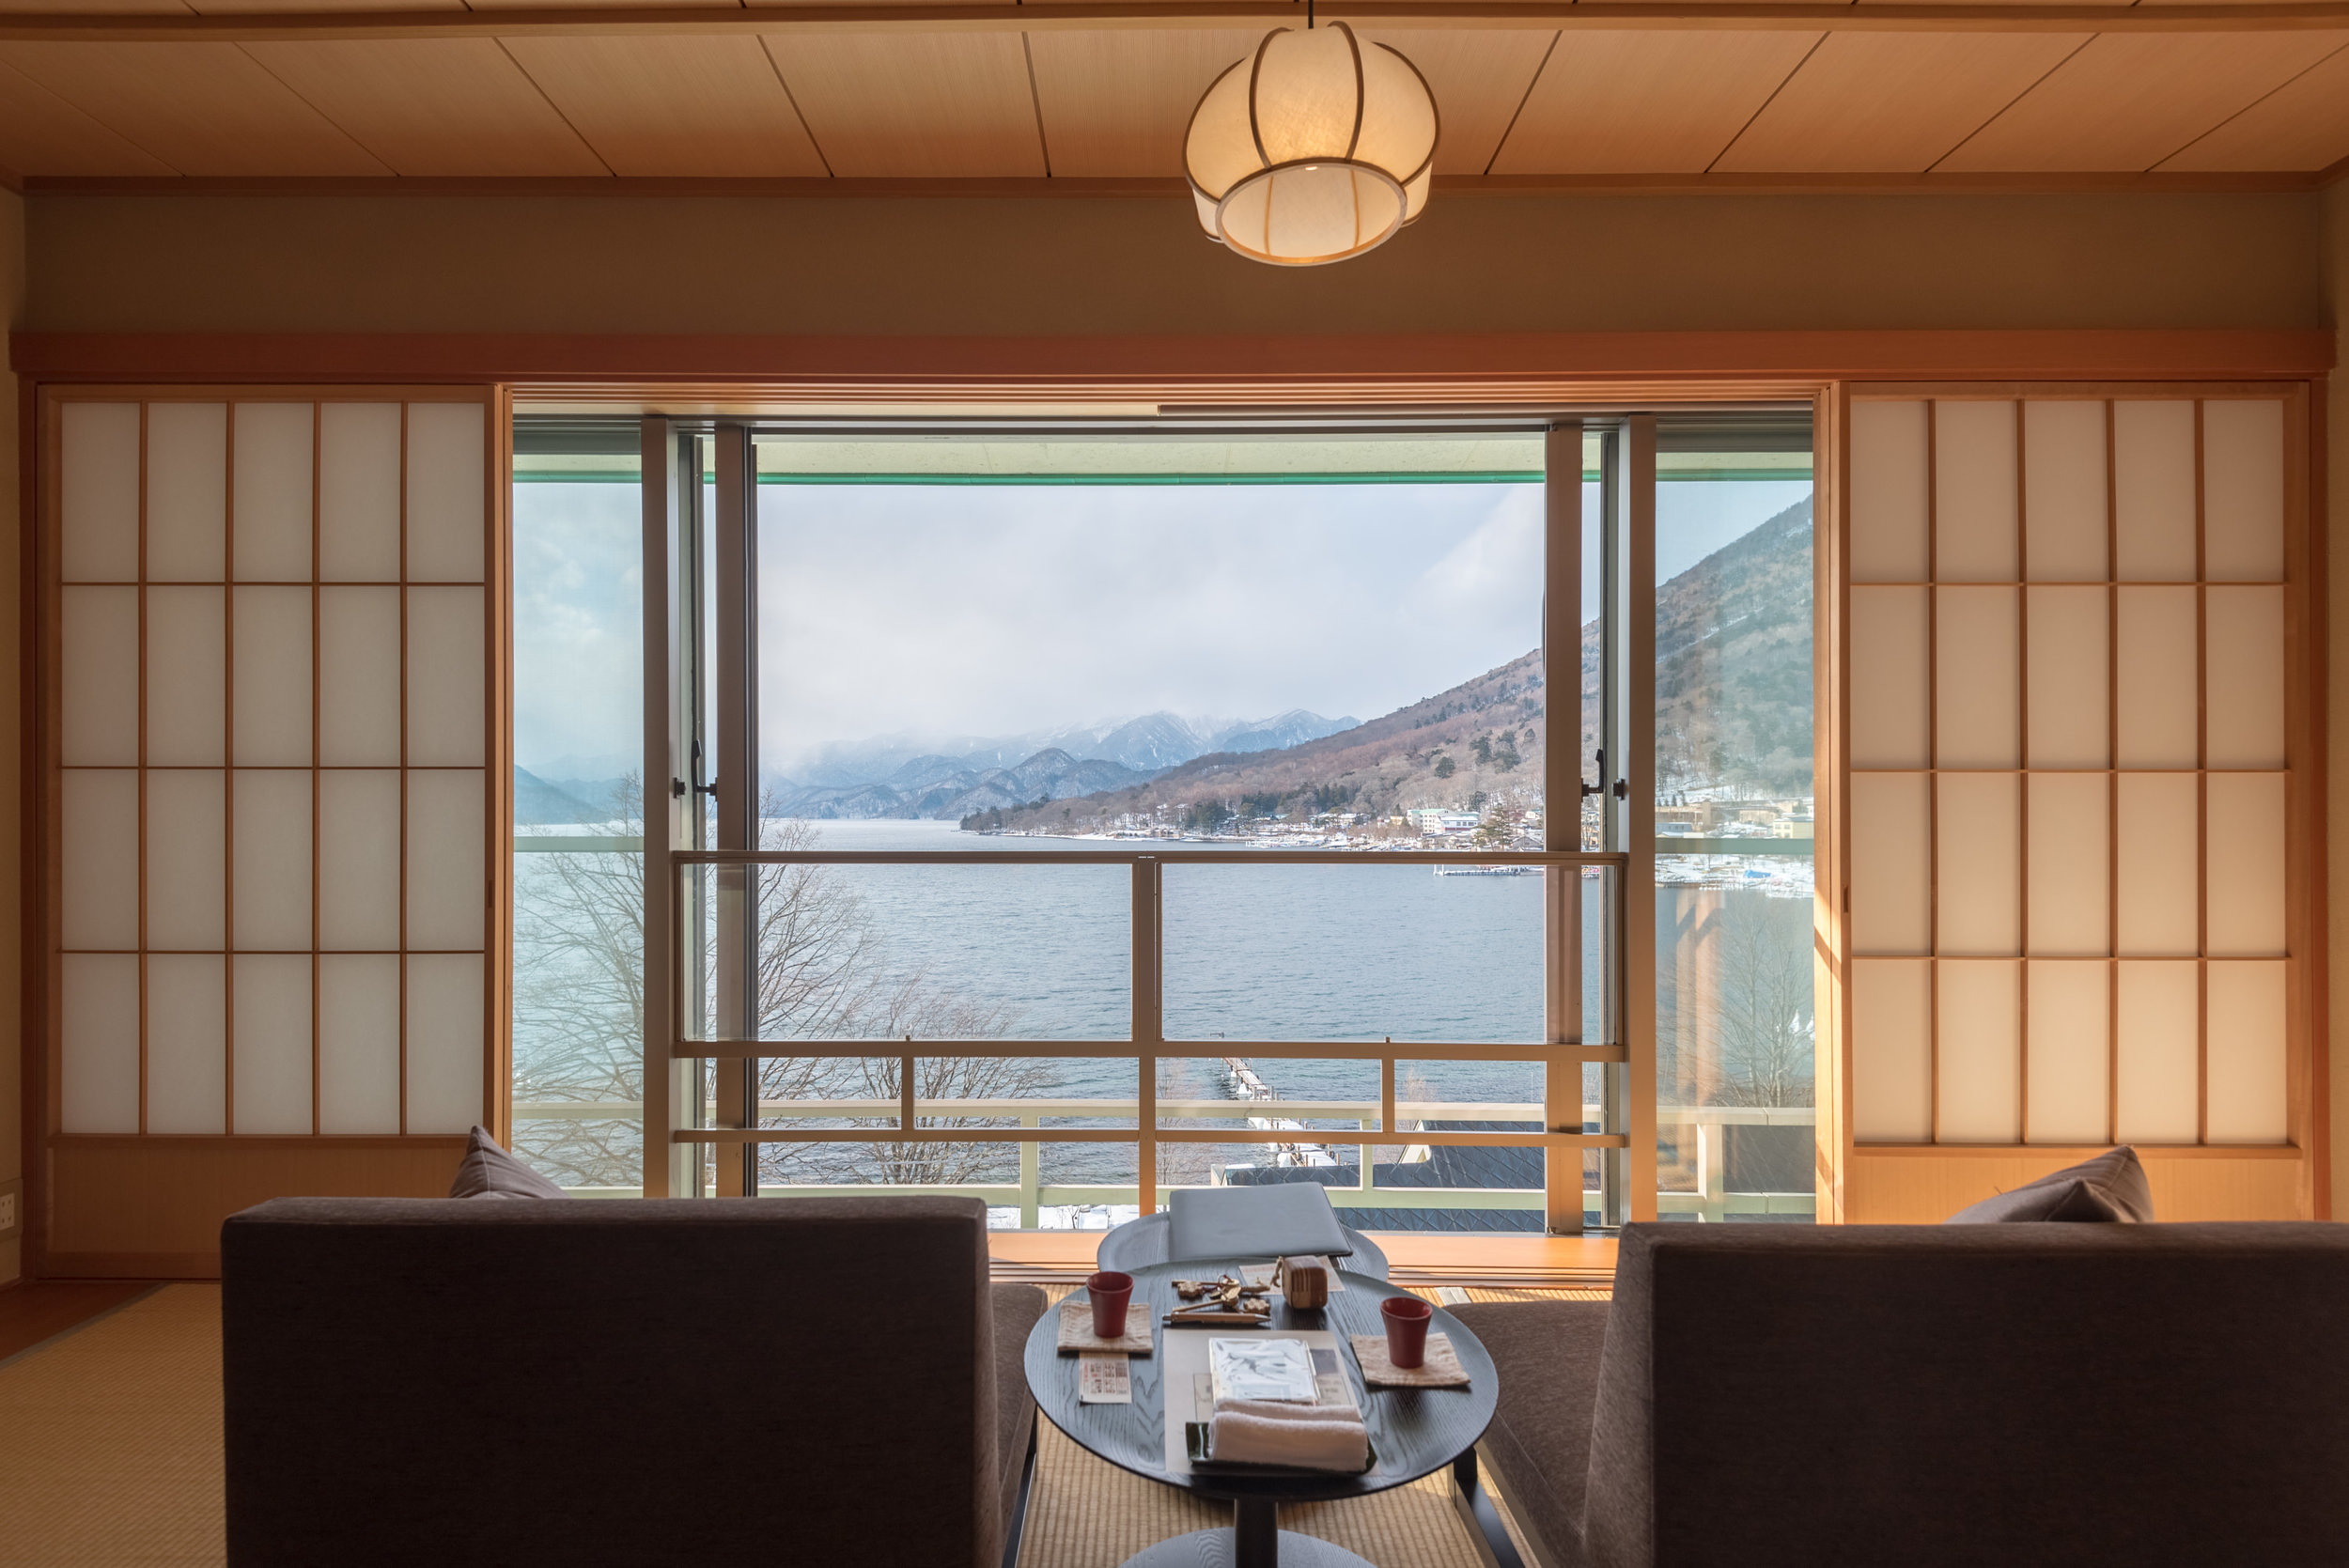 Window and Sliding Shoji Screens  Japanese-style Room with Lake View GL2 - Hoshino Resorts KAI Nikko